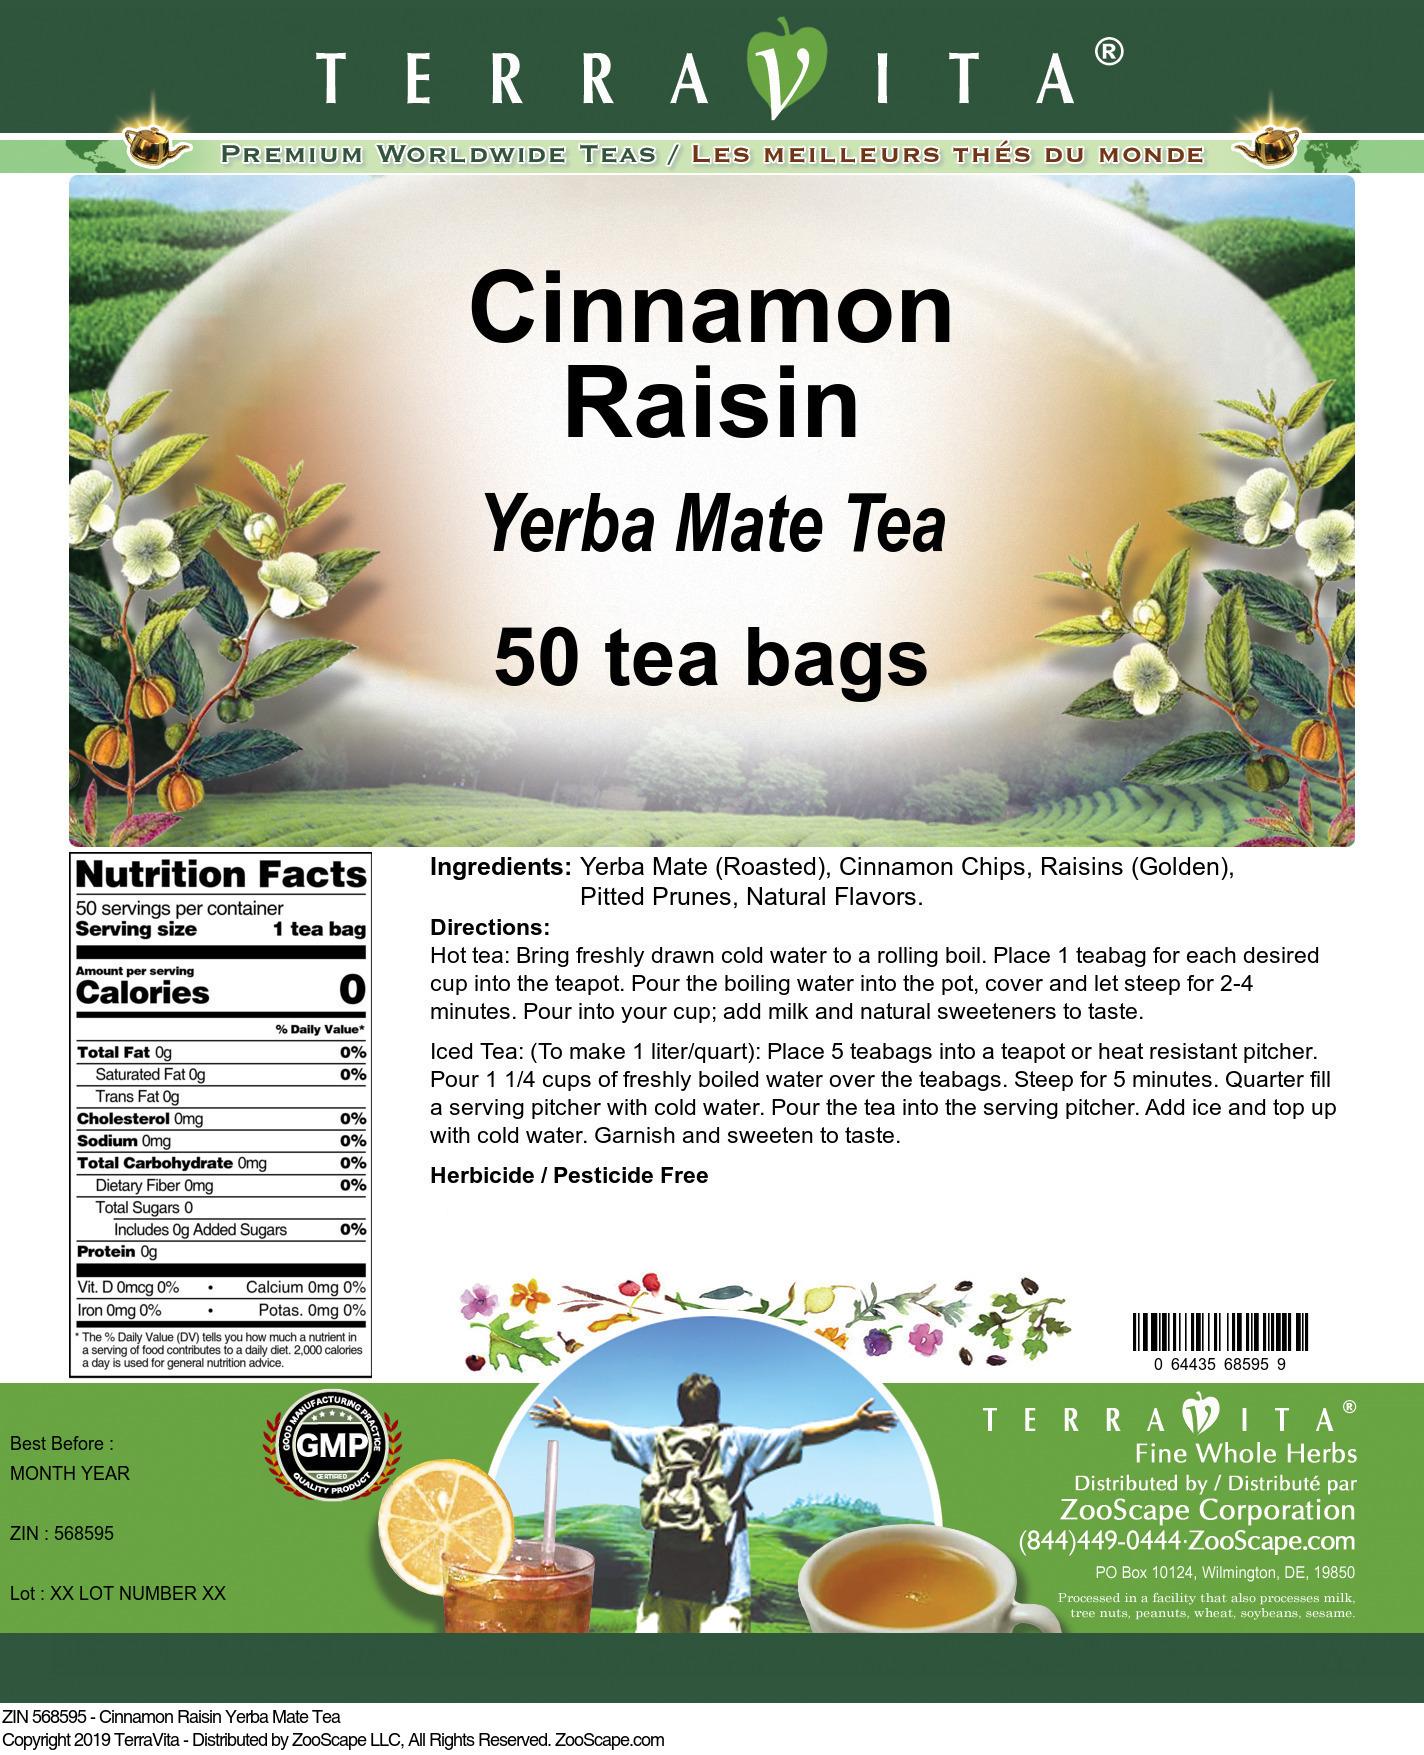 Cinnamon Raisin Yerba Mate Tea